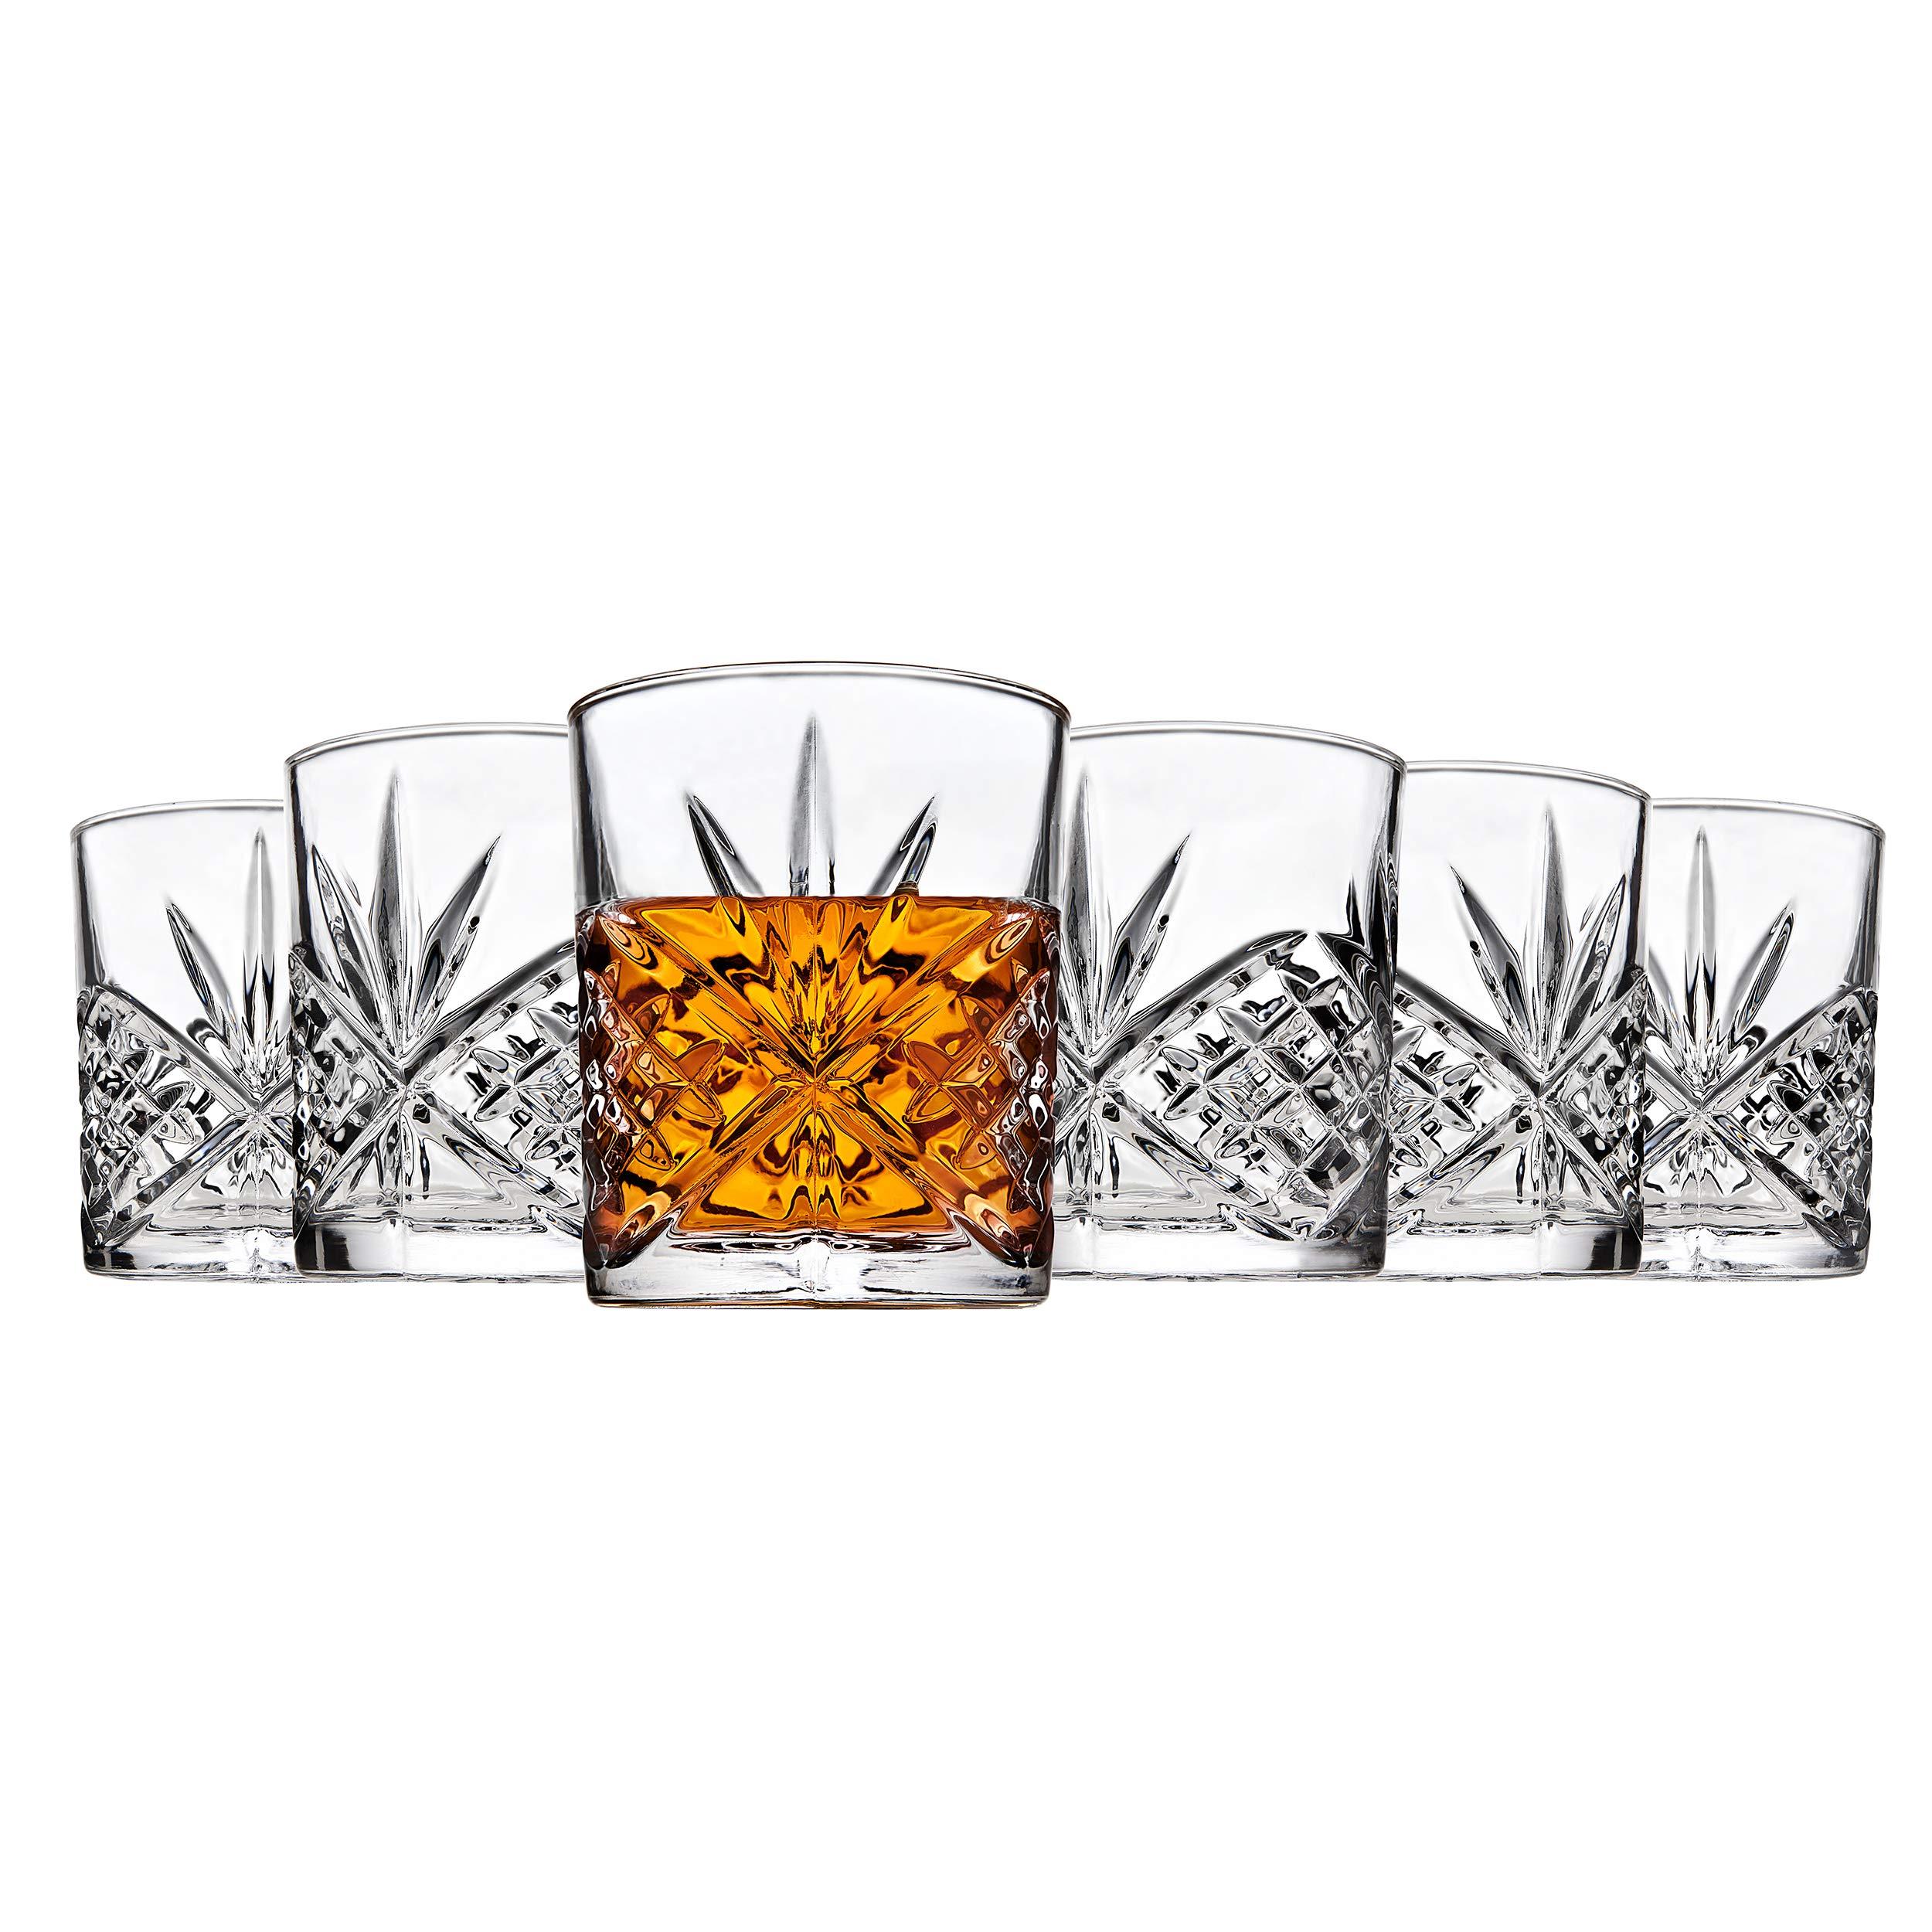 Godinger Dublin Double Old Fashioned Glasses, Set of 6 by Godinger